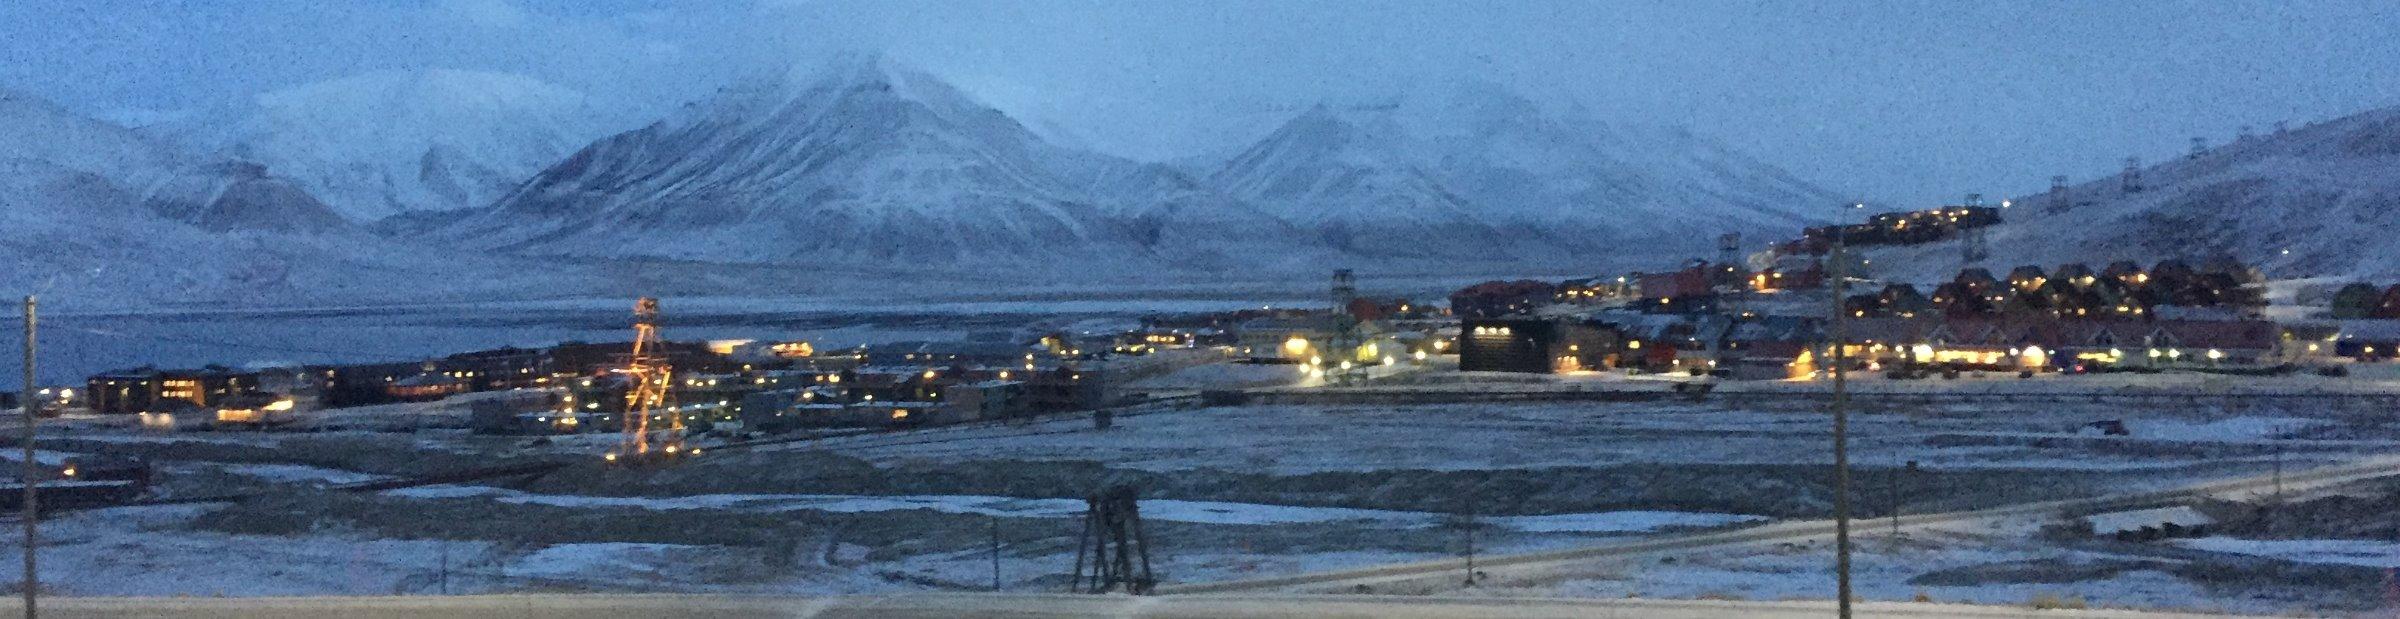 Svalbard